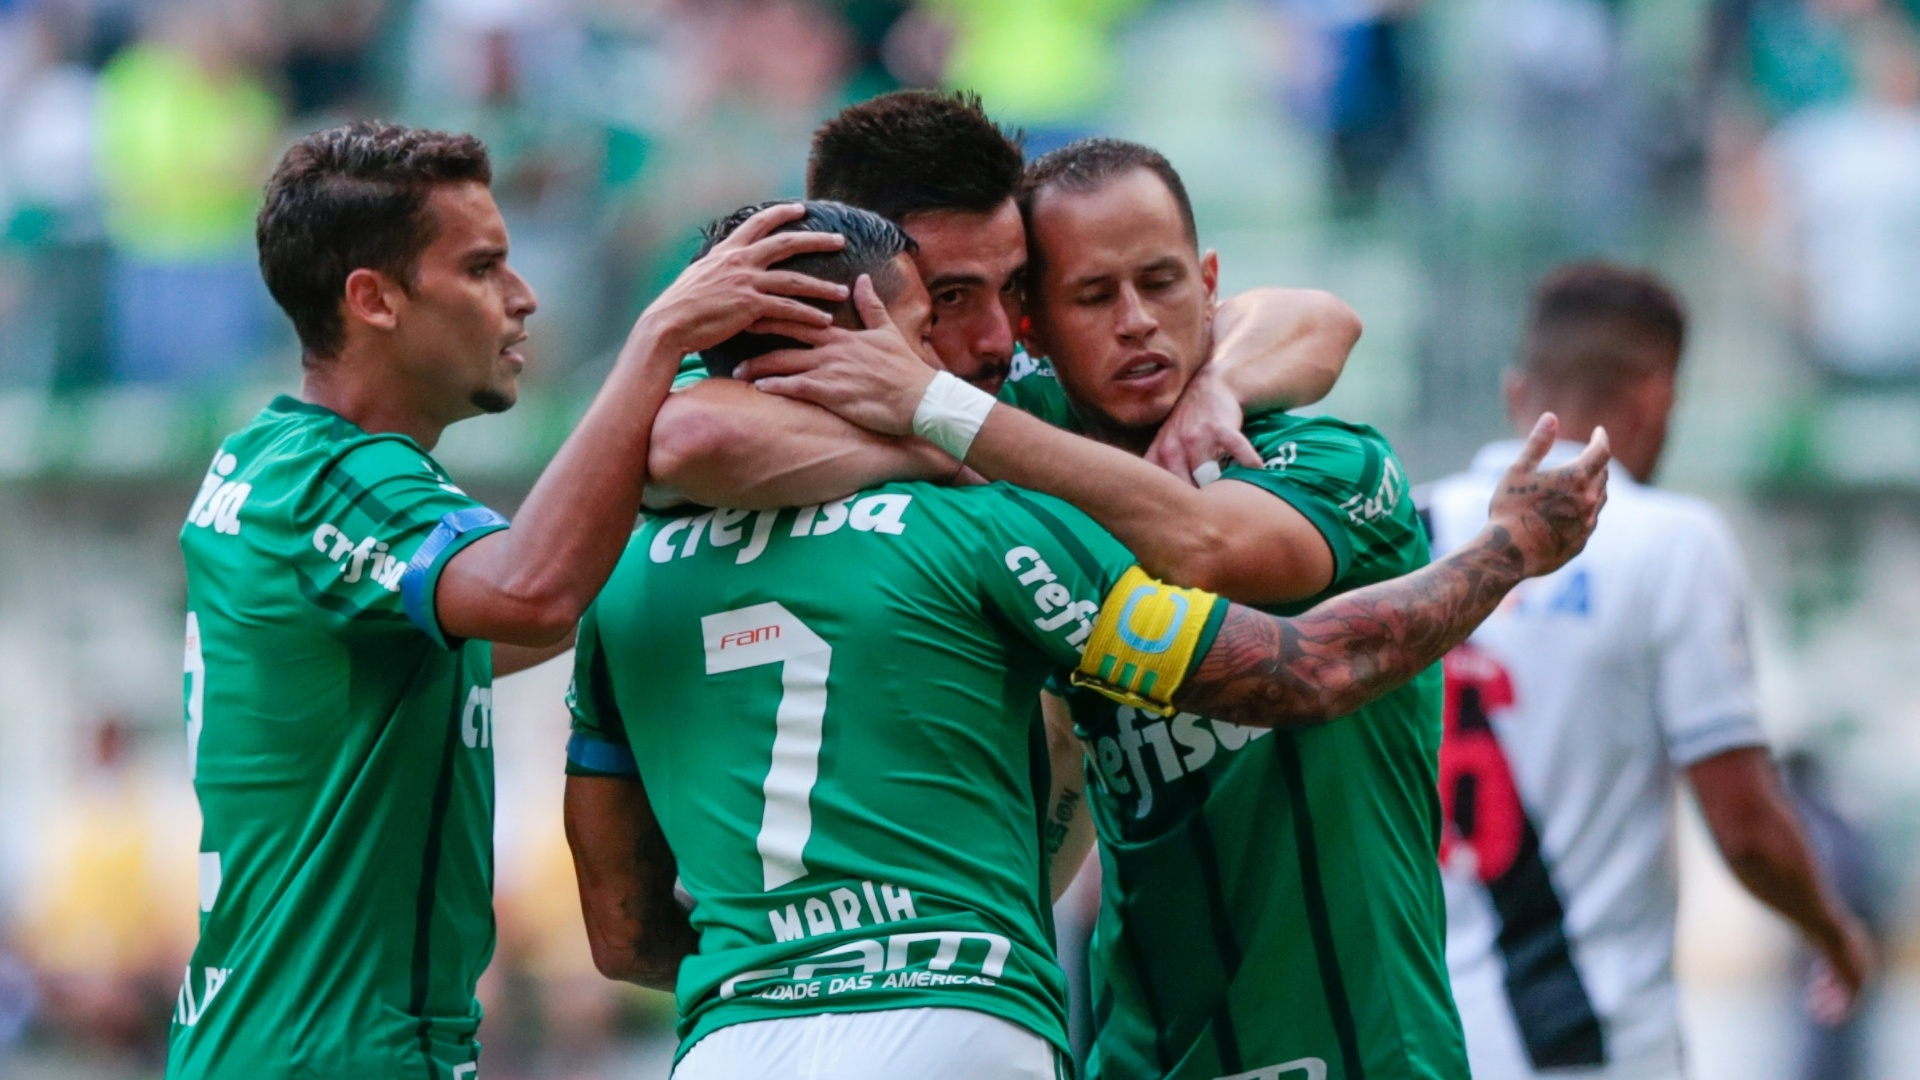 Jogadores do Palmeiras comemoram o gol marcado por Jean diante do Vasco no Campeonato Brasileiro